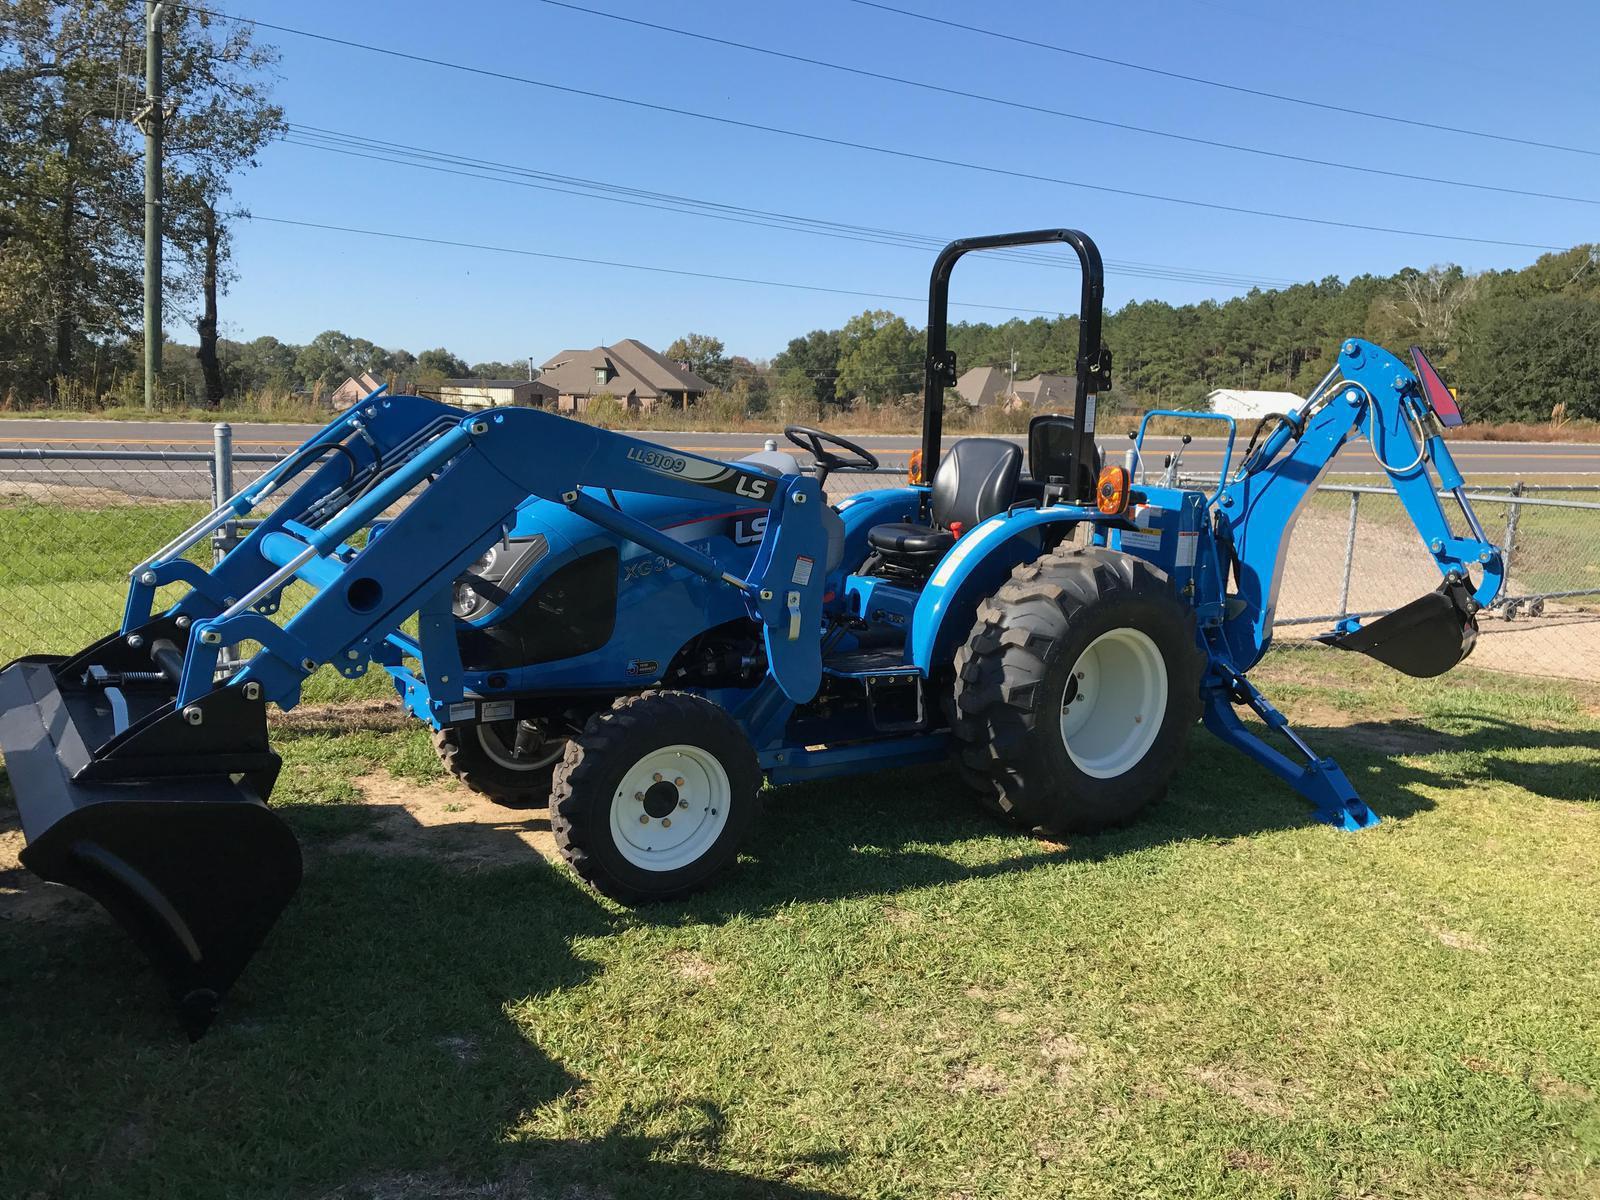 Inventory from LS Tractor and Texas Bragg 4-H Equipment, LLC Denham